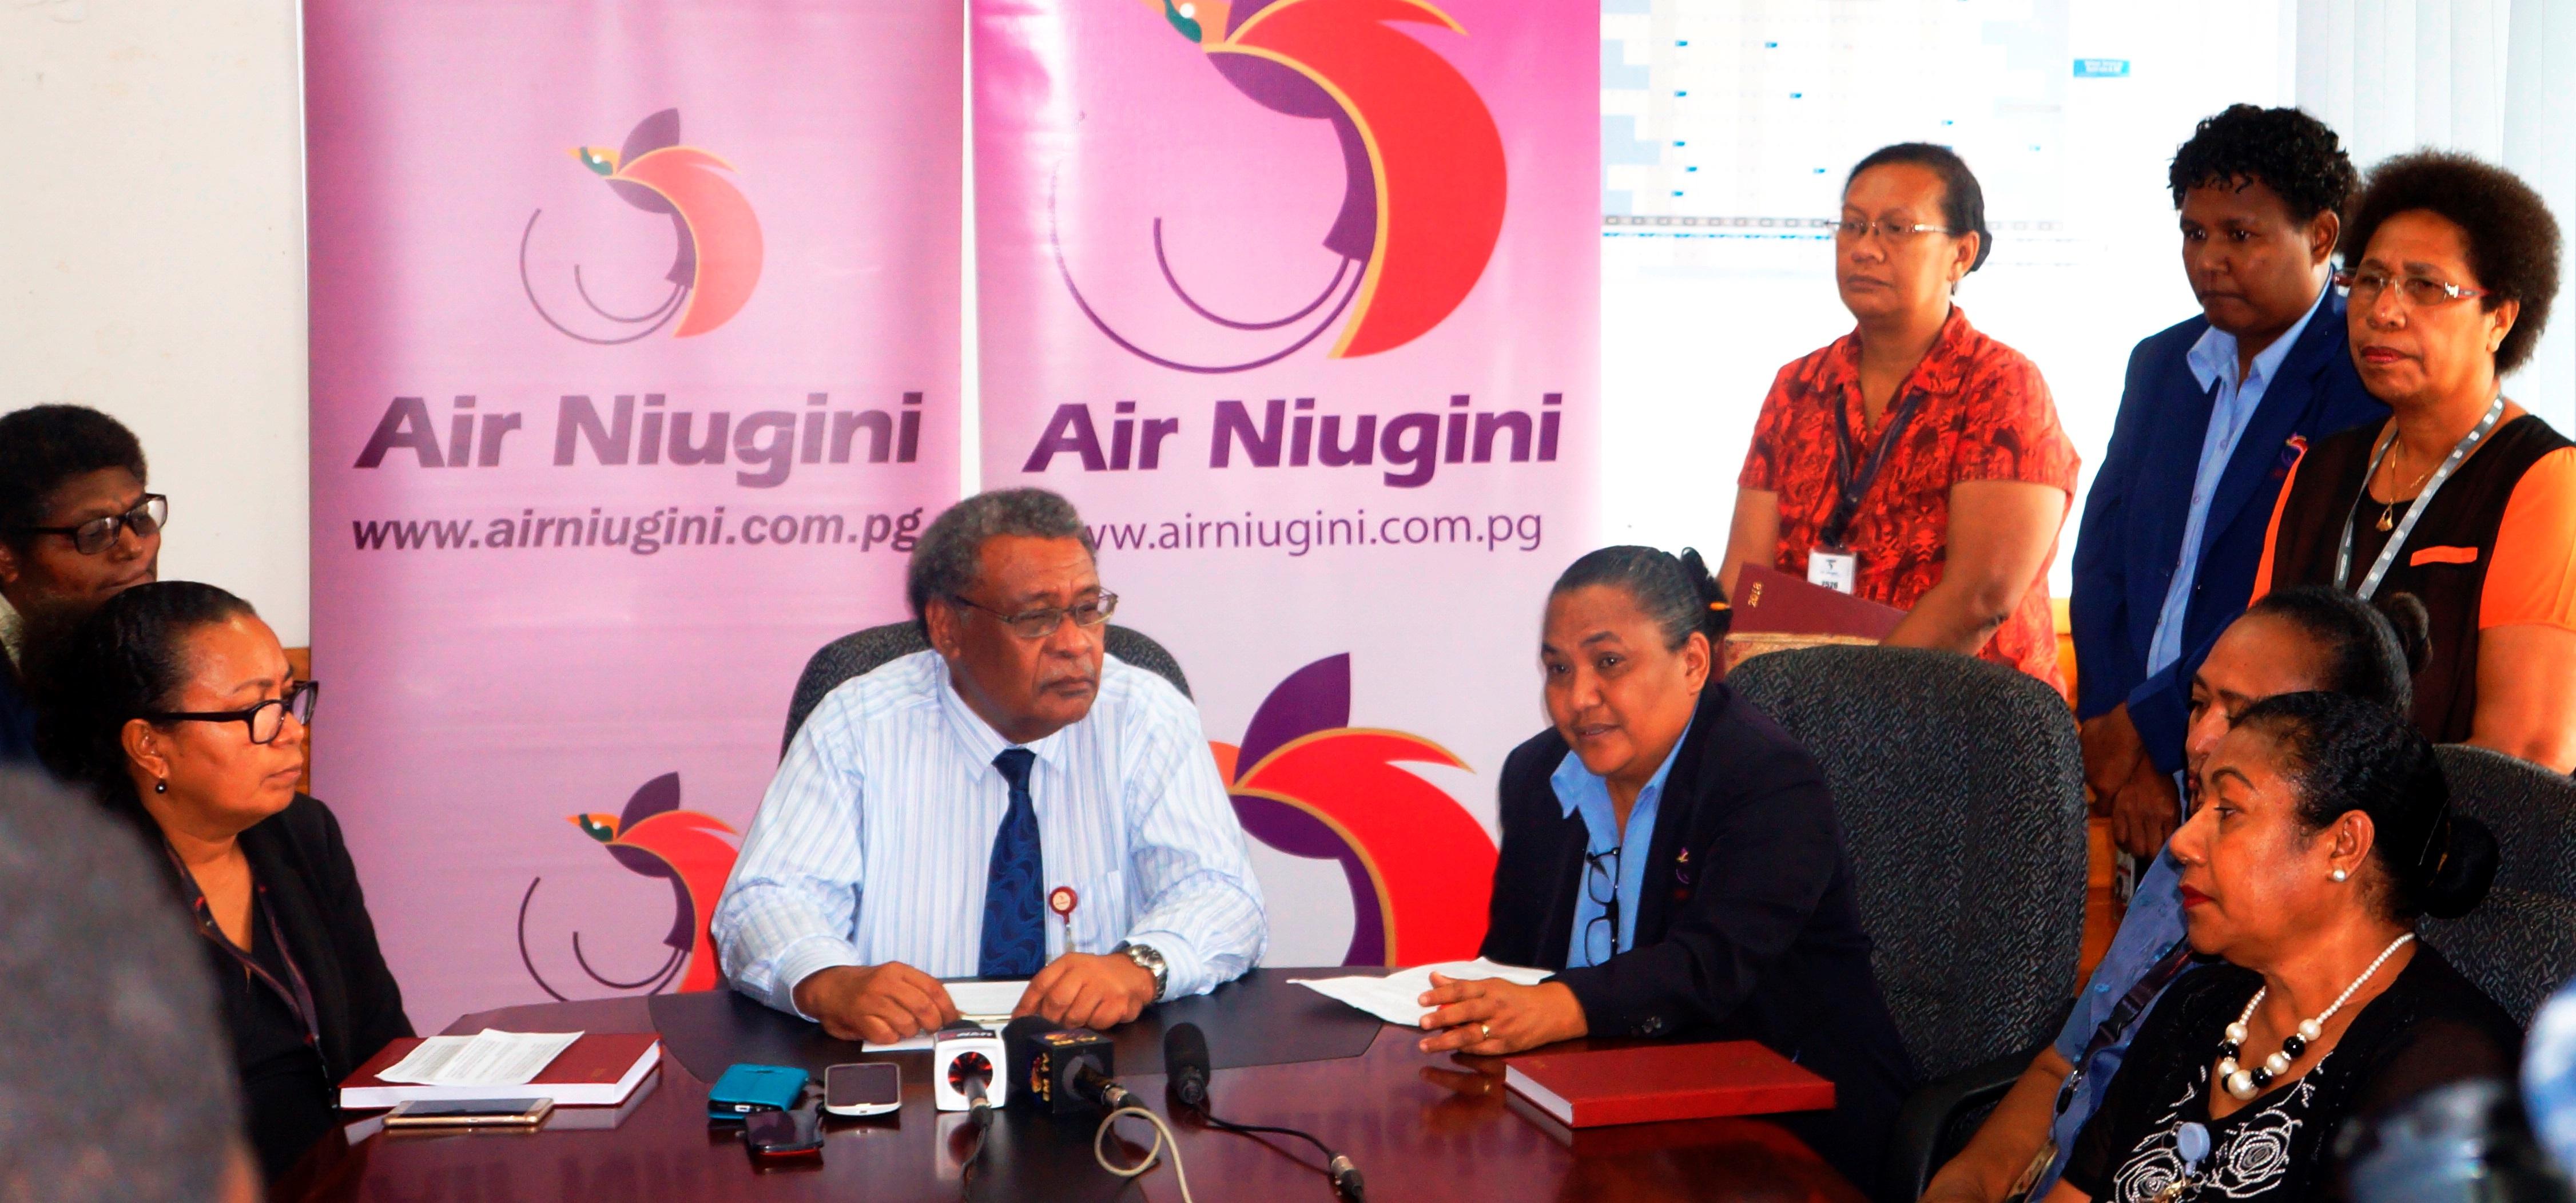 Air Niugini's Emerging Leaders Program proving a Success